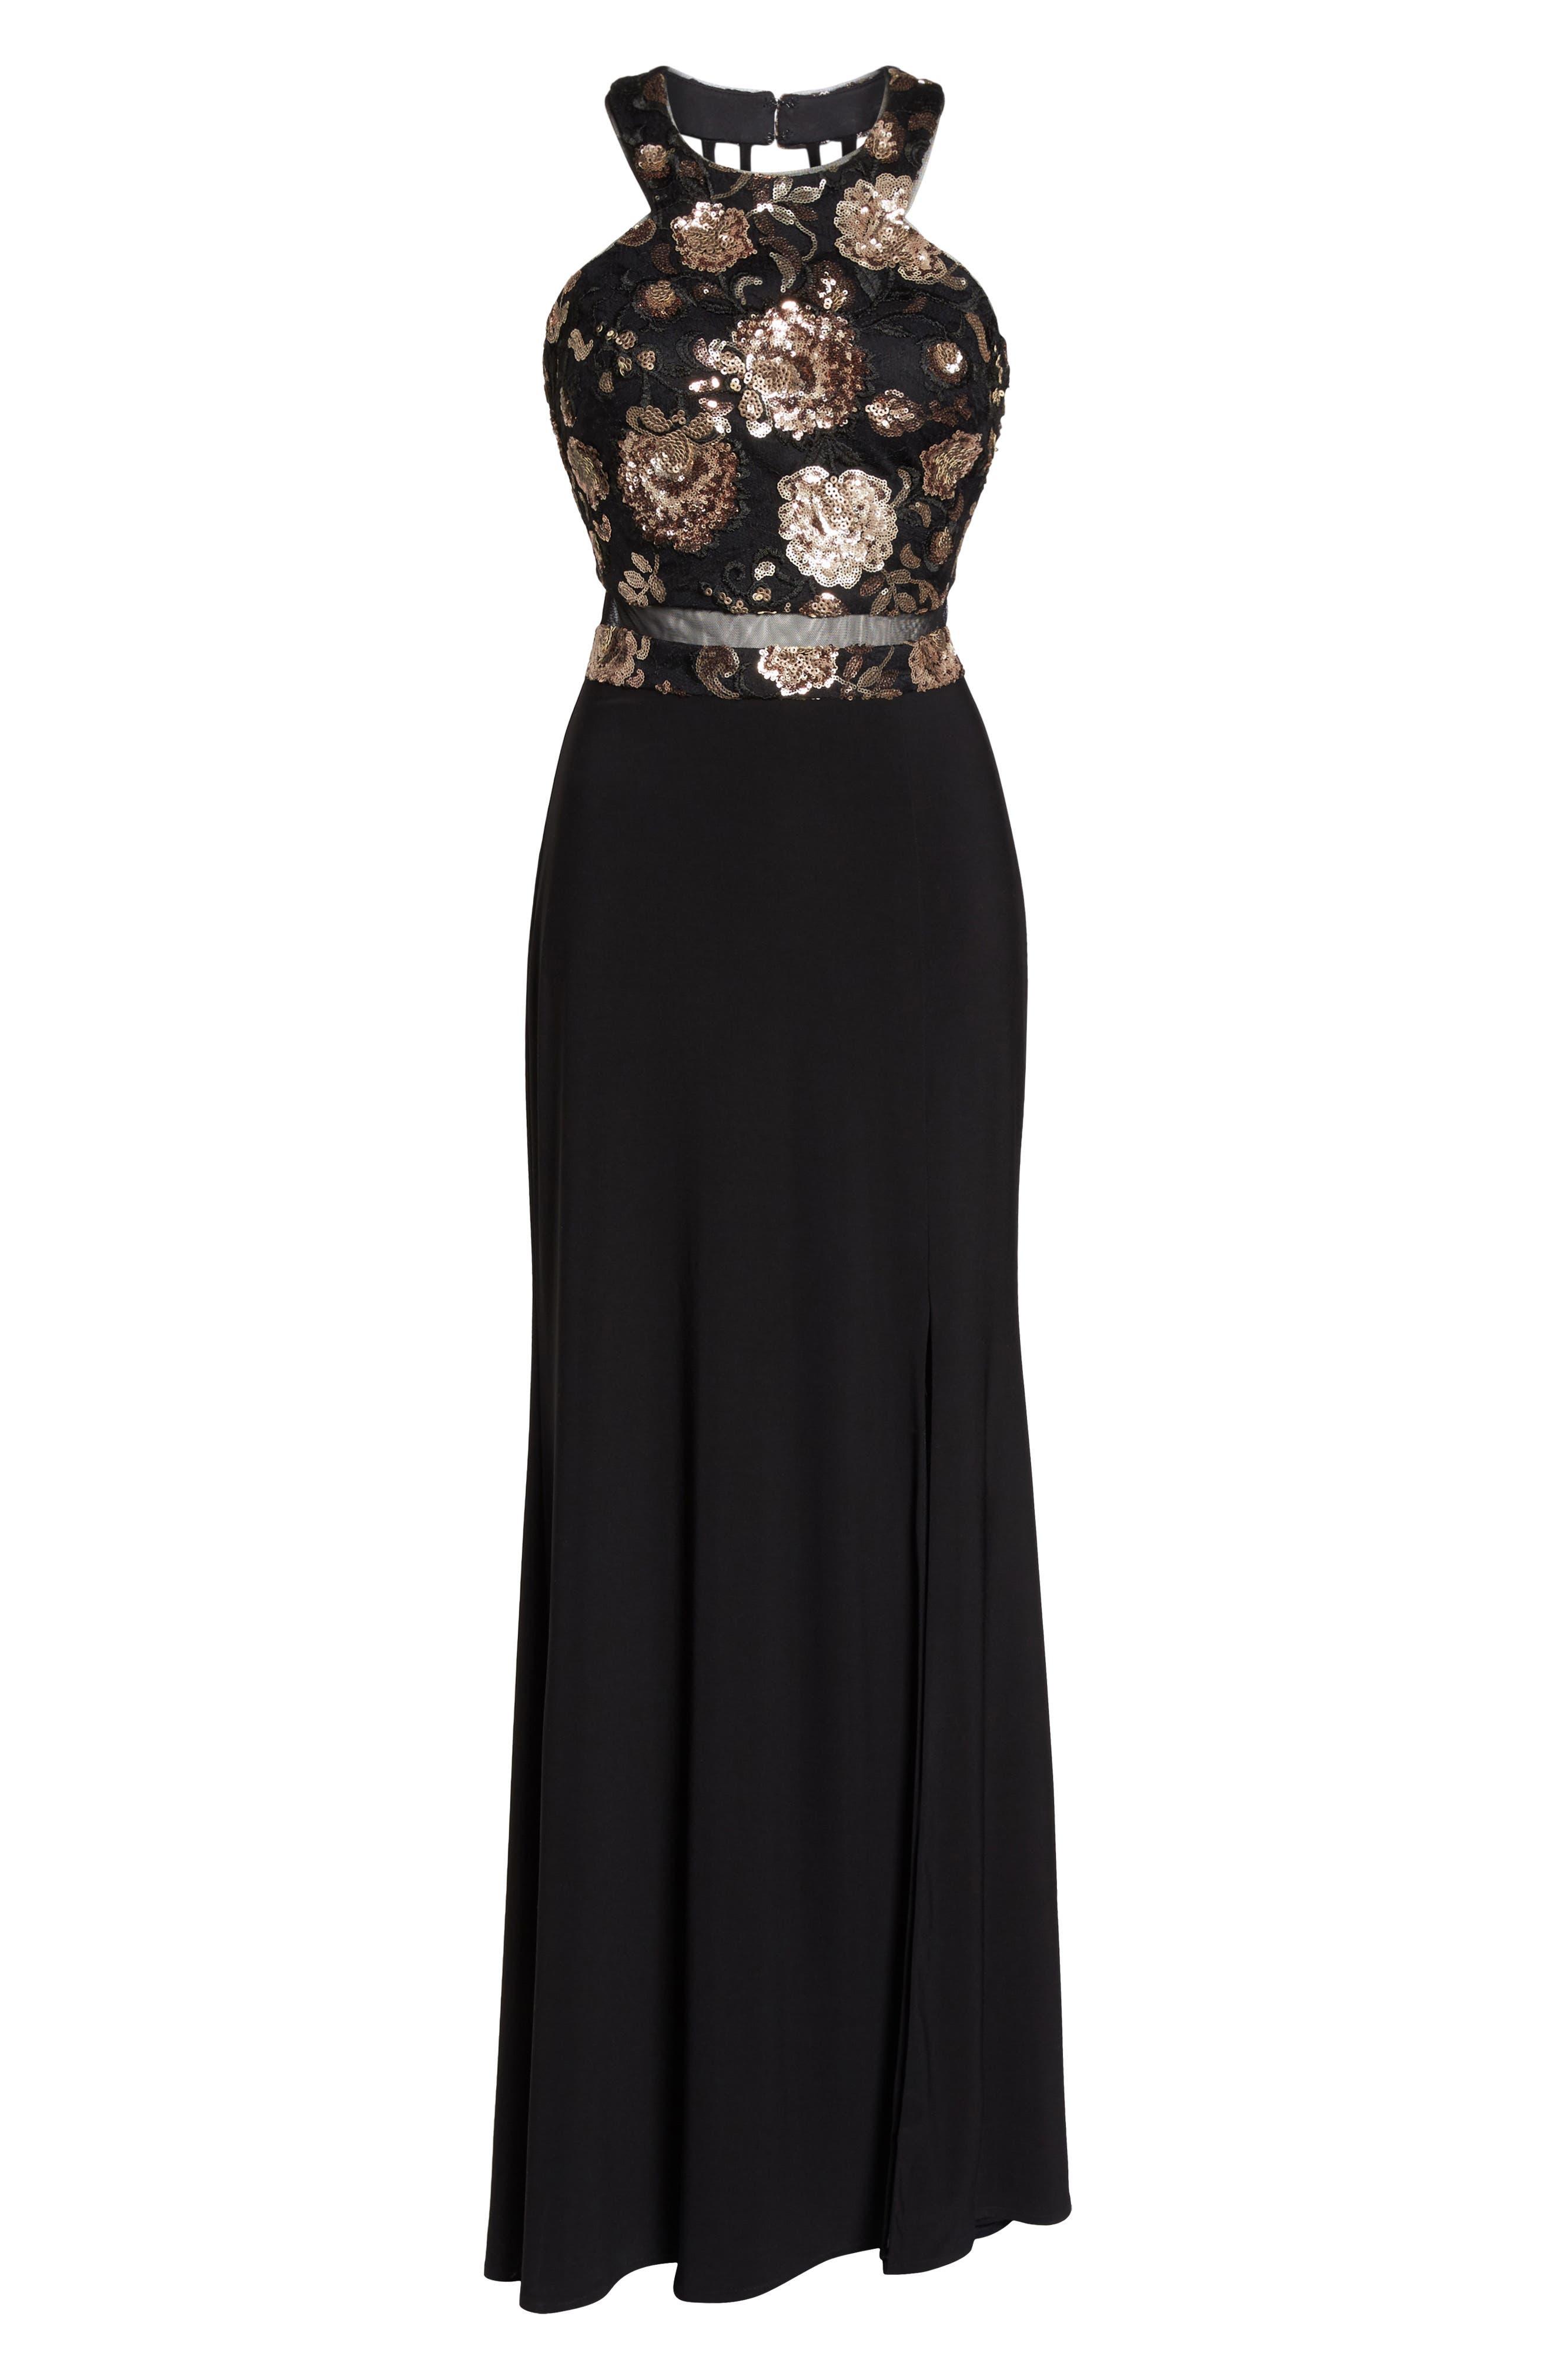 Sequin Mesh Panel Gown,                             Alternate thumbnail 6, color,                             Black / Rose Gold